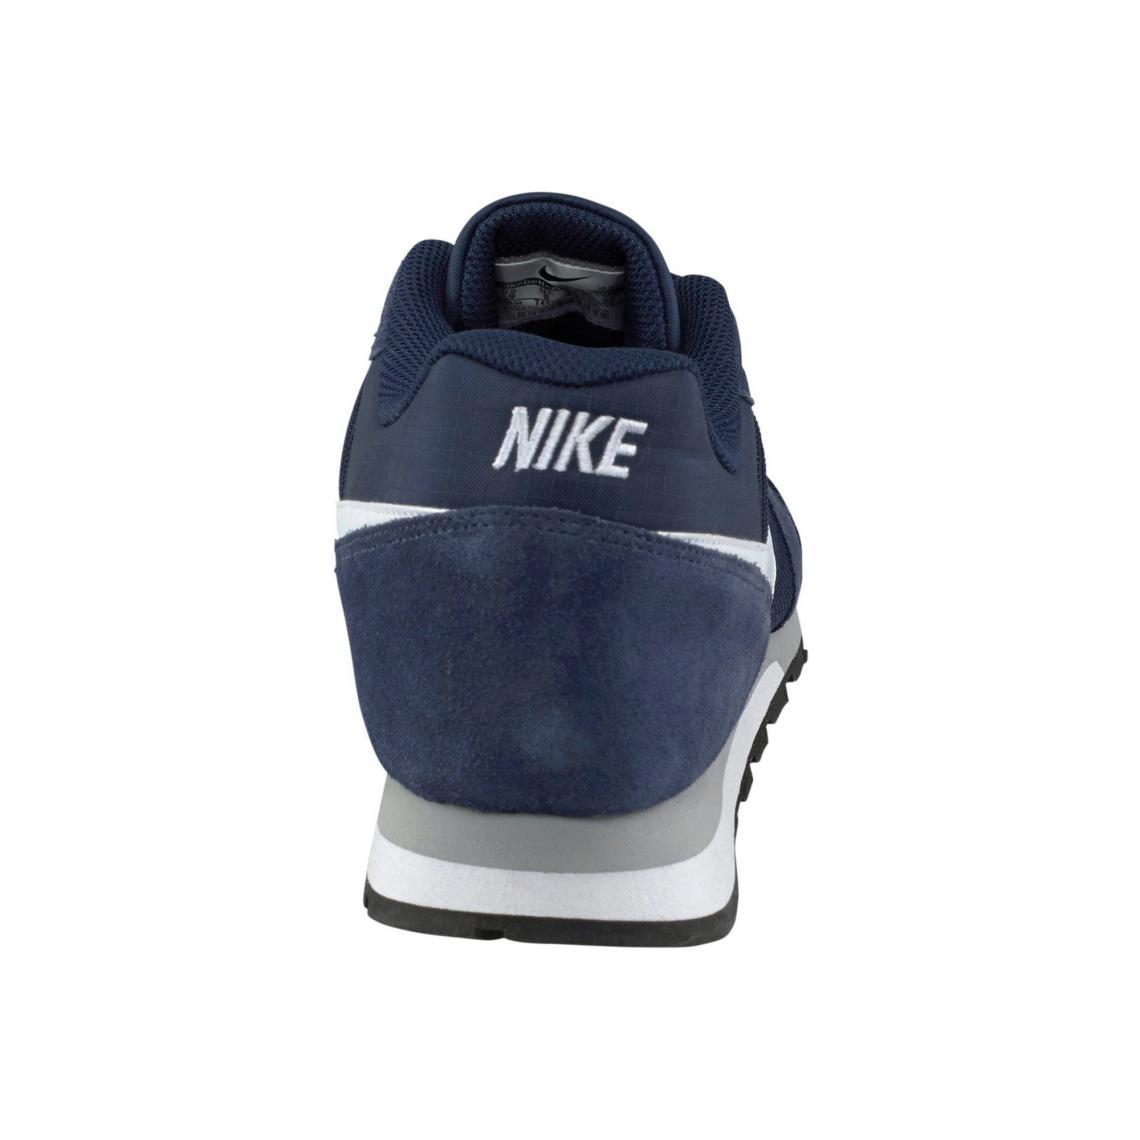 Md Nike De Bleu3 2 Tennis Suisses Homme Runner Chaussures mO0vN8nw